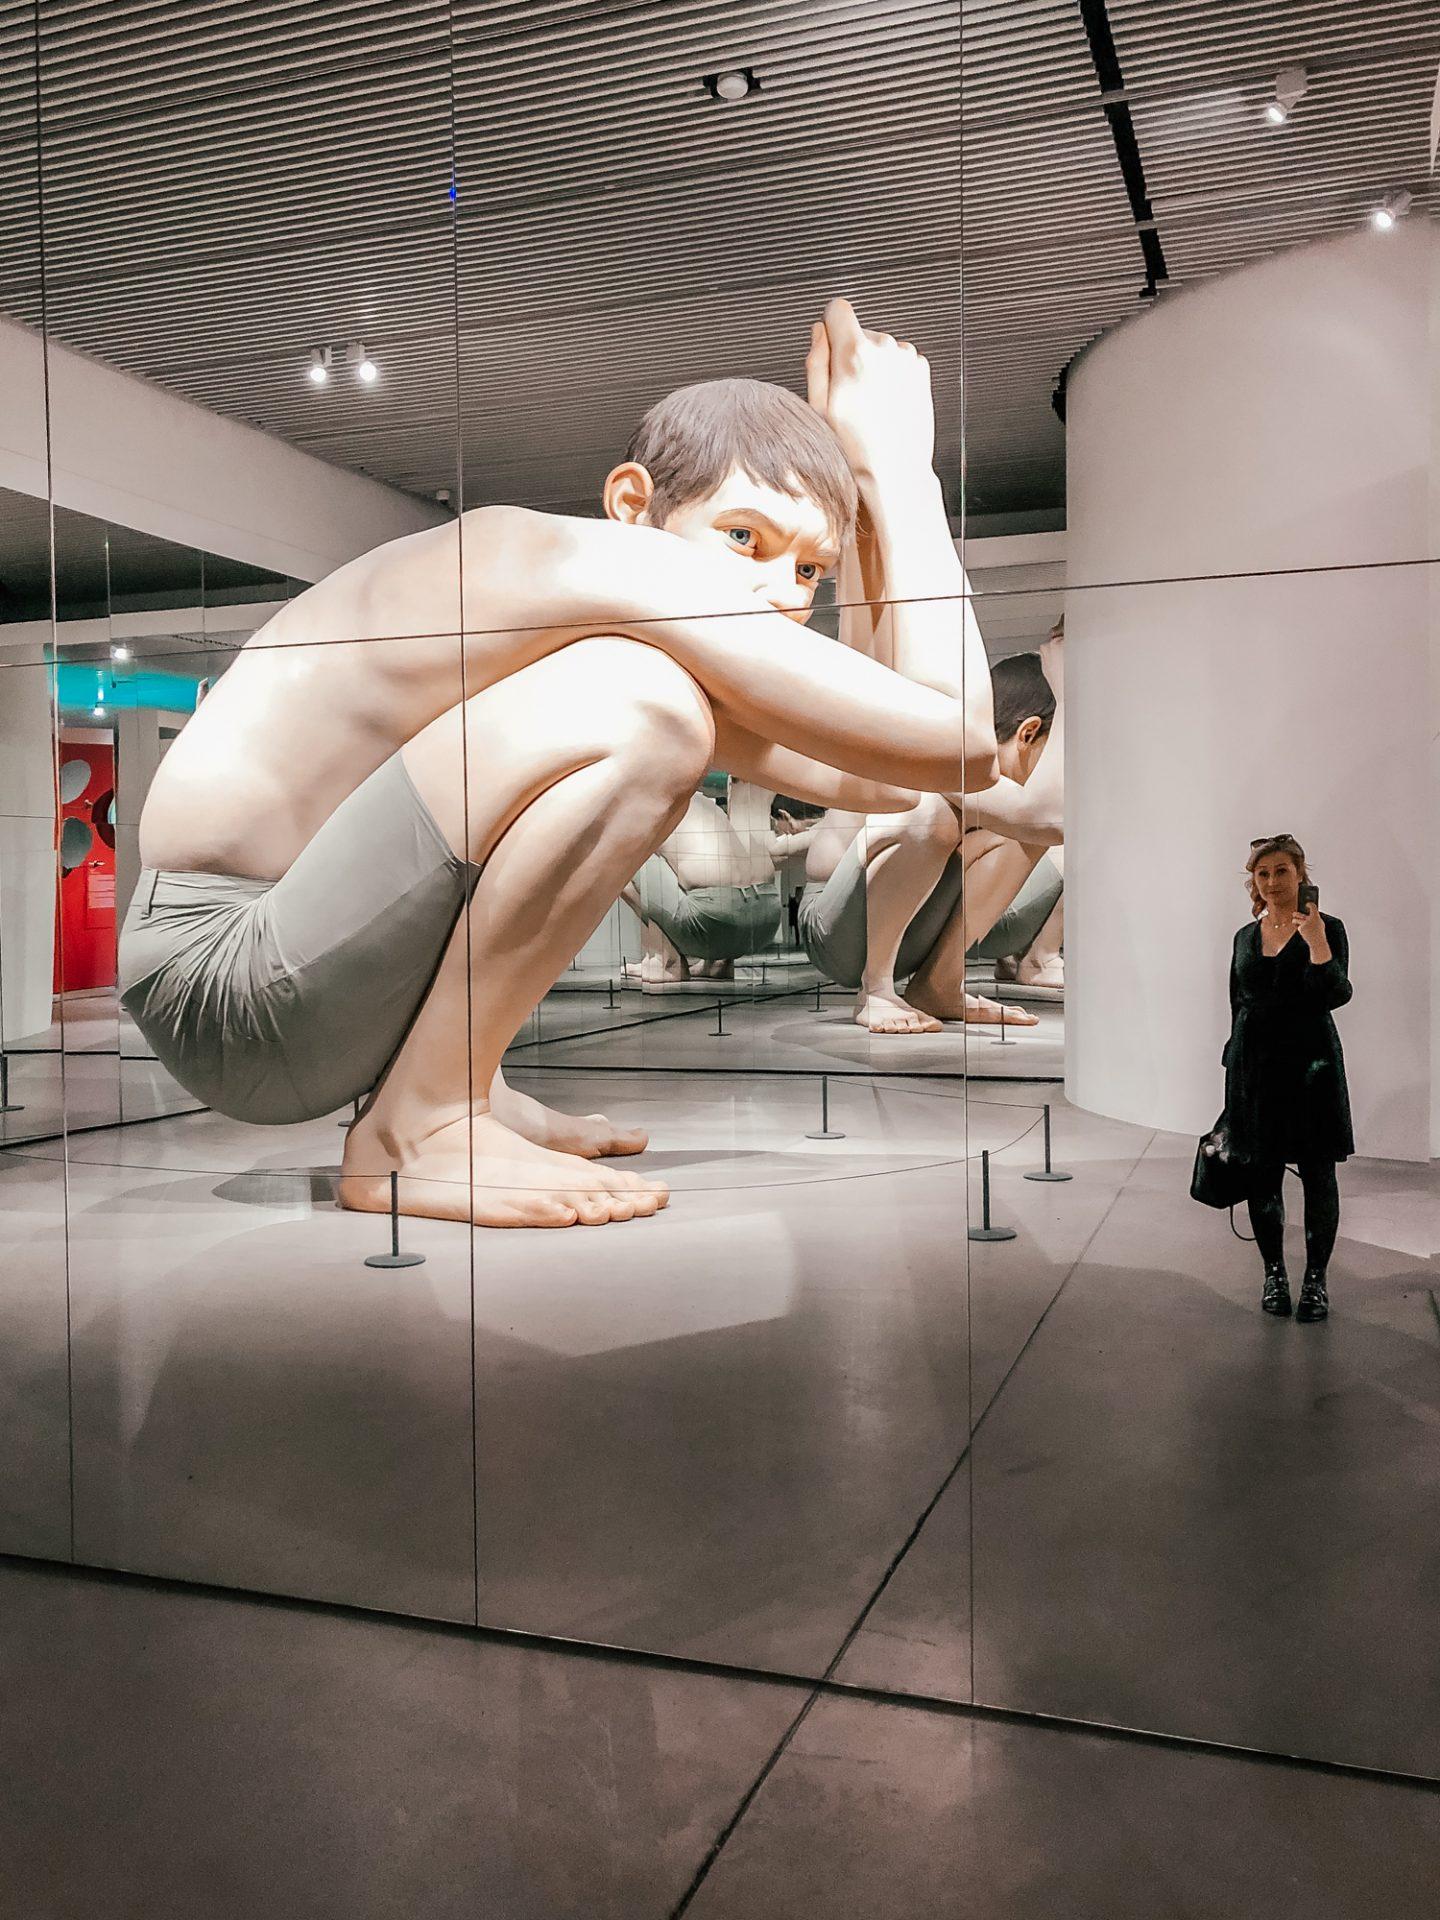 Aarhus Denmark Travel Guide Aros Art Museum Ron Mueck Boy Primetime Chaos